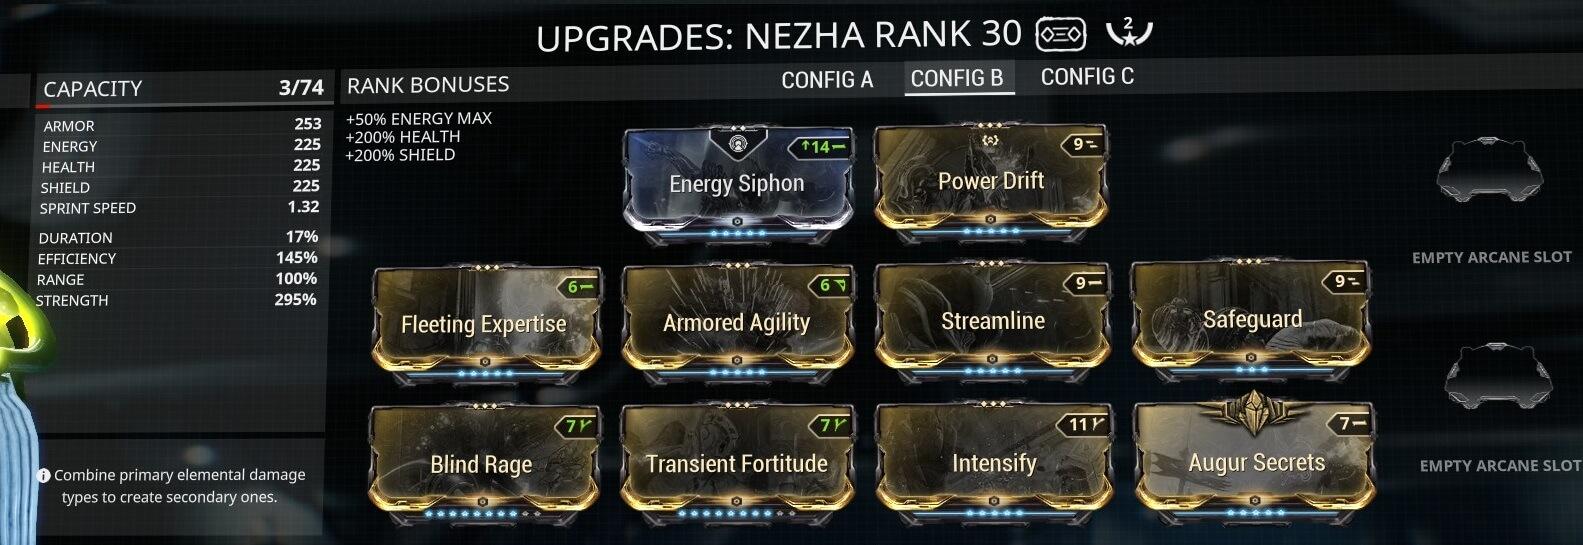 Nezha Safeguard 2 Forma Build